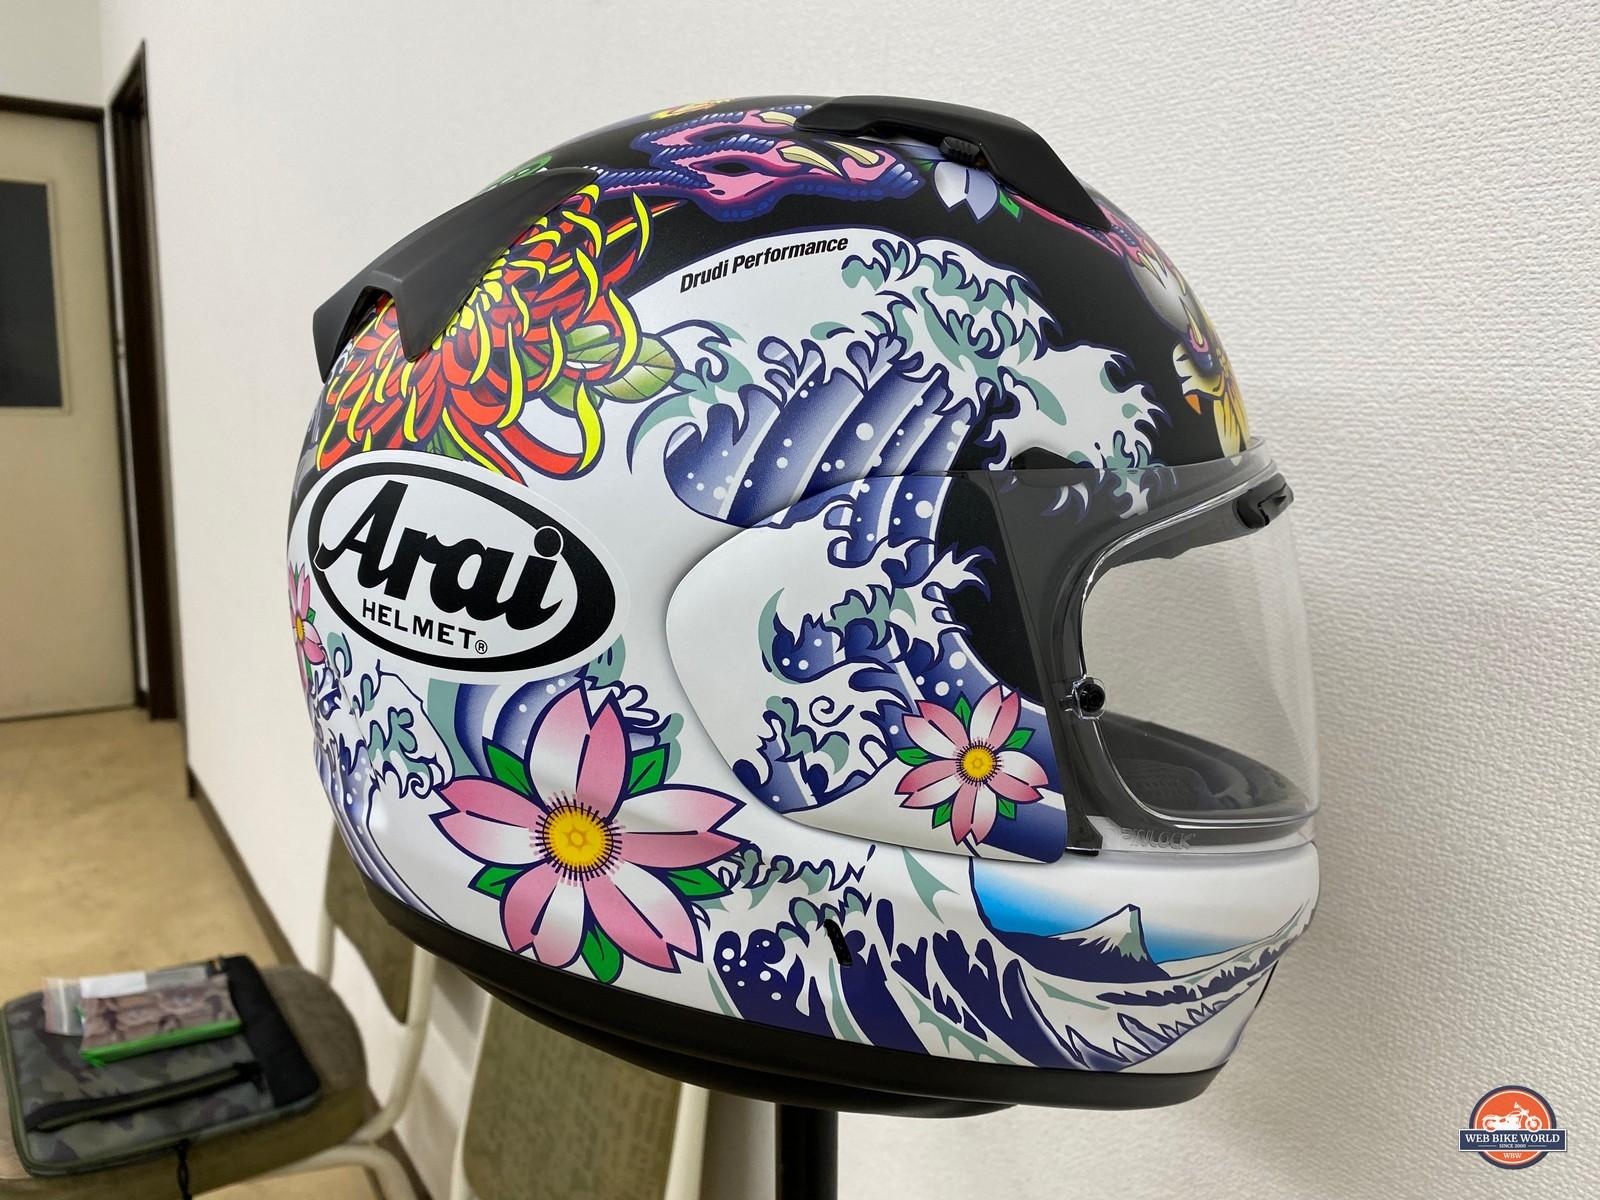 A Drudi Performance decal design on an Arai helmet.